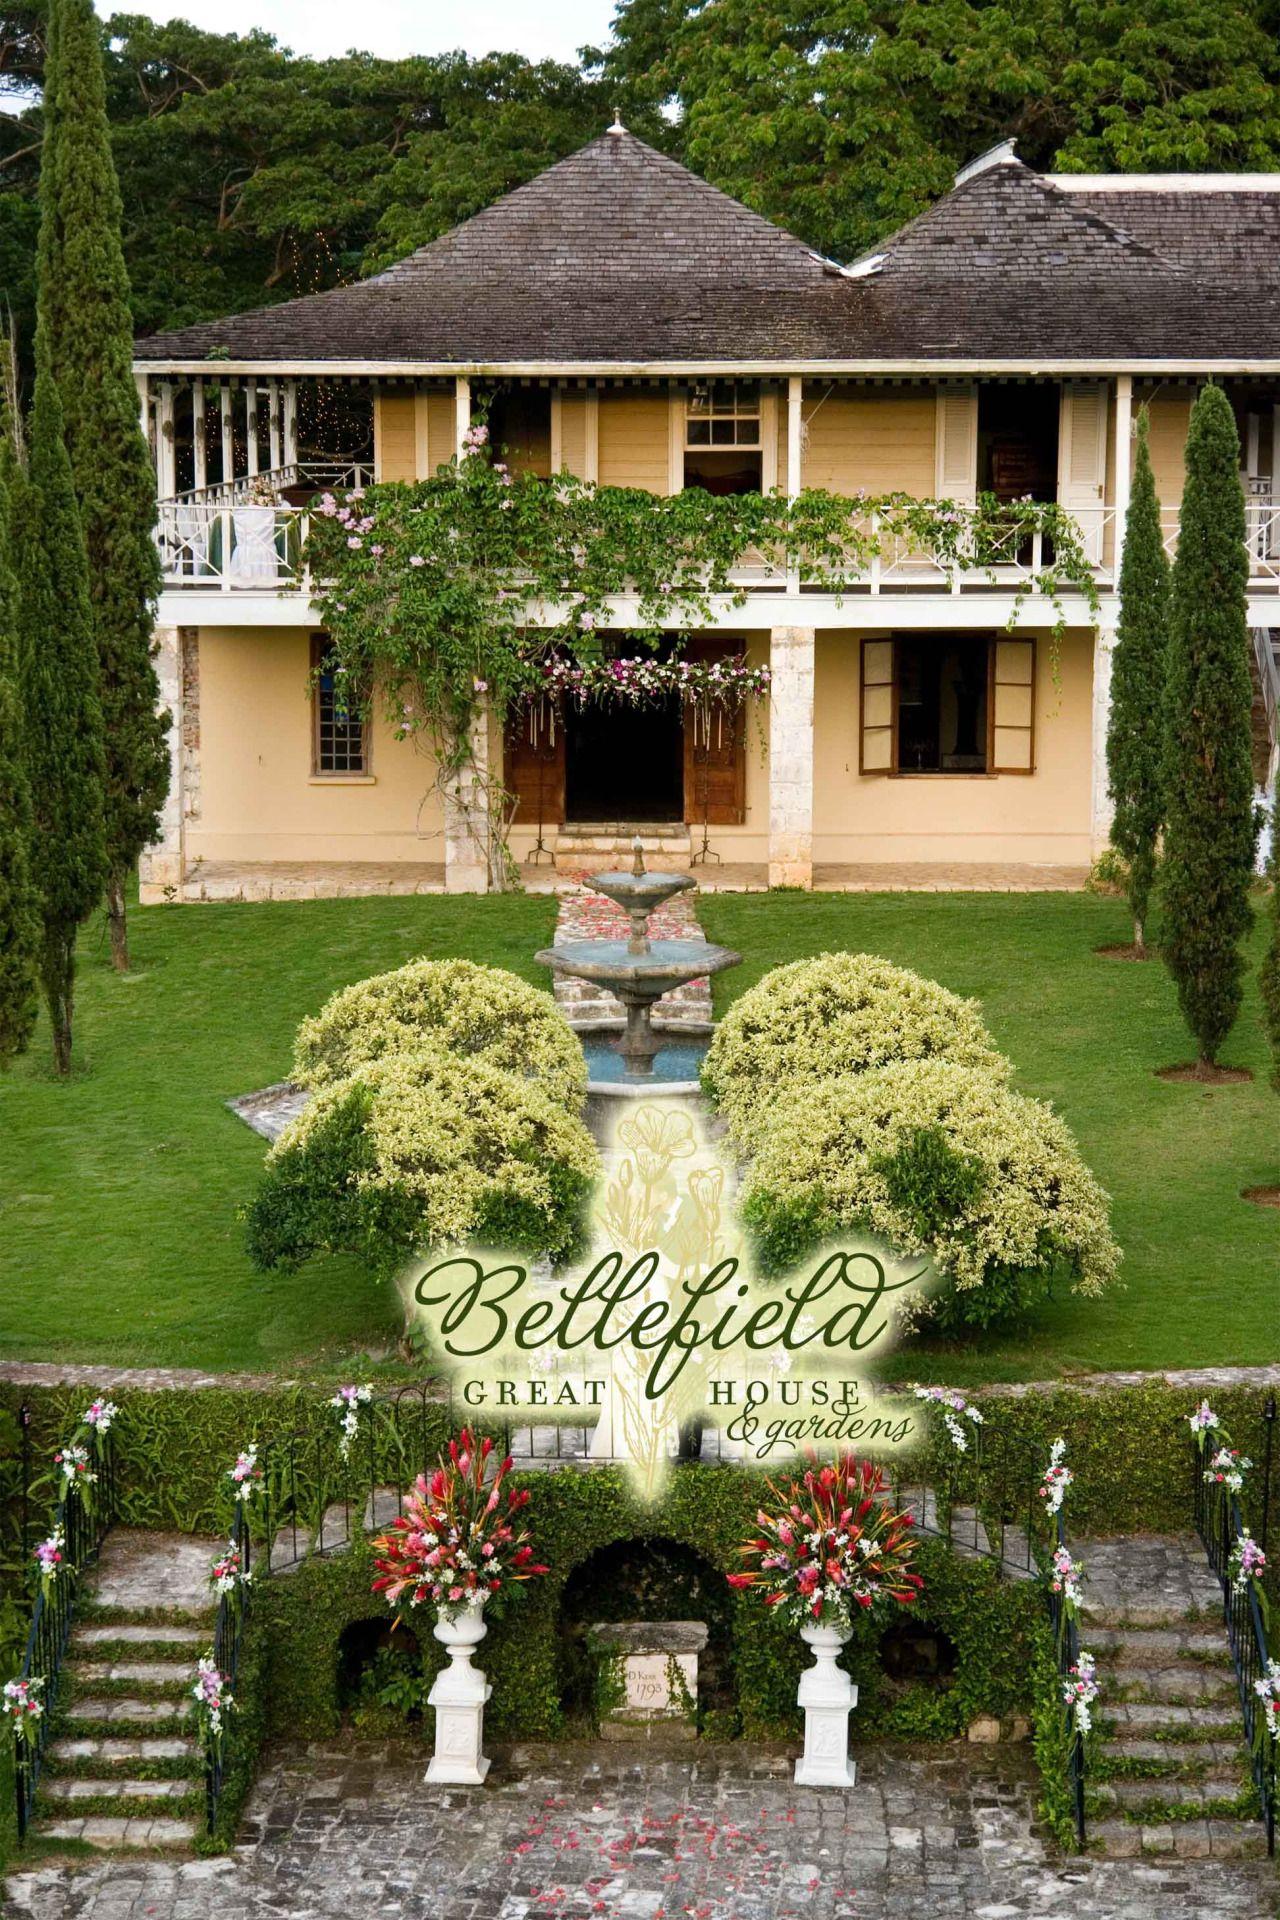 Bellefield Great House Gardens Montego Bay St James Jamaica